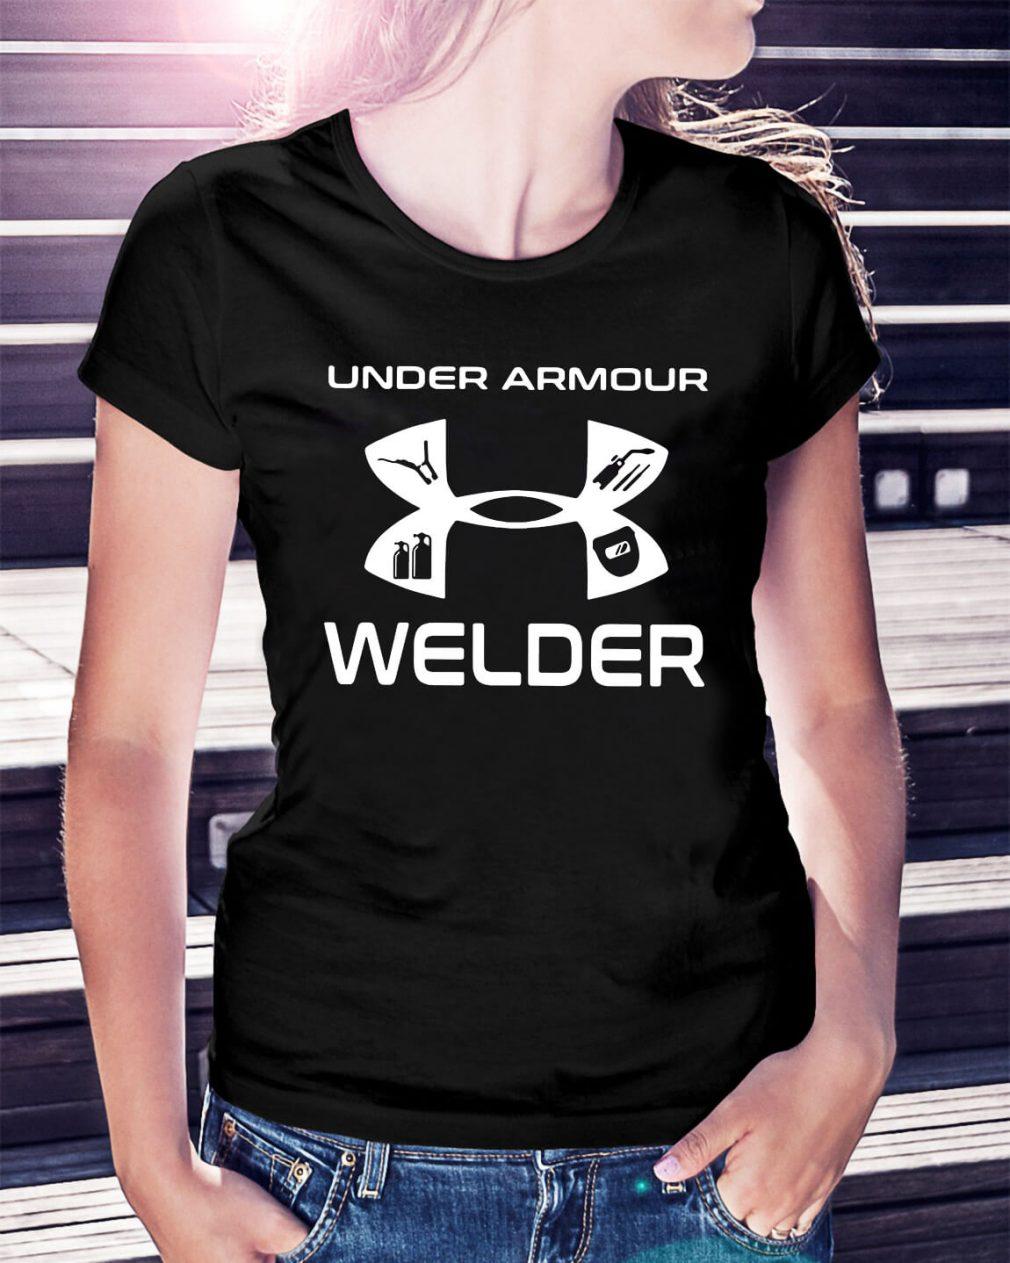 Under armour welder Ladies Tee